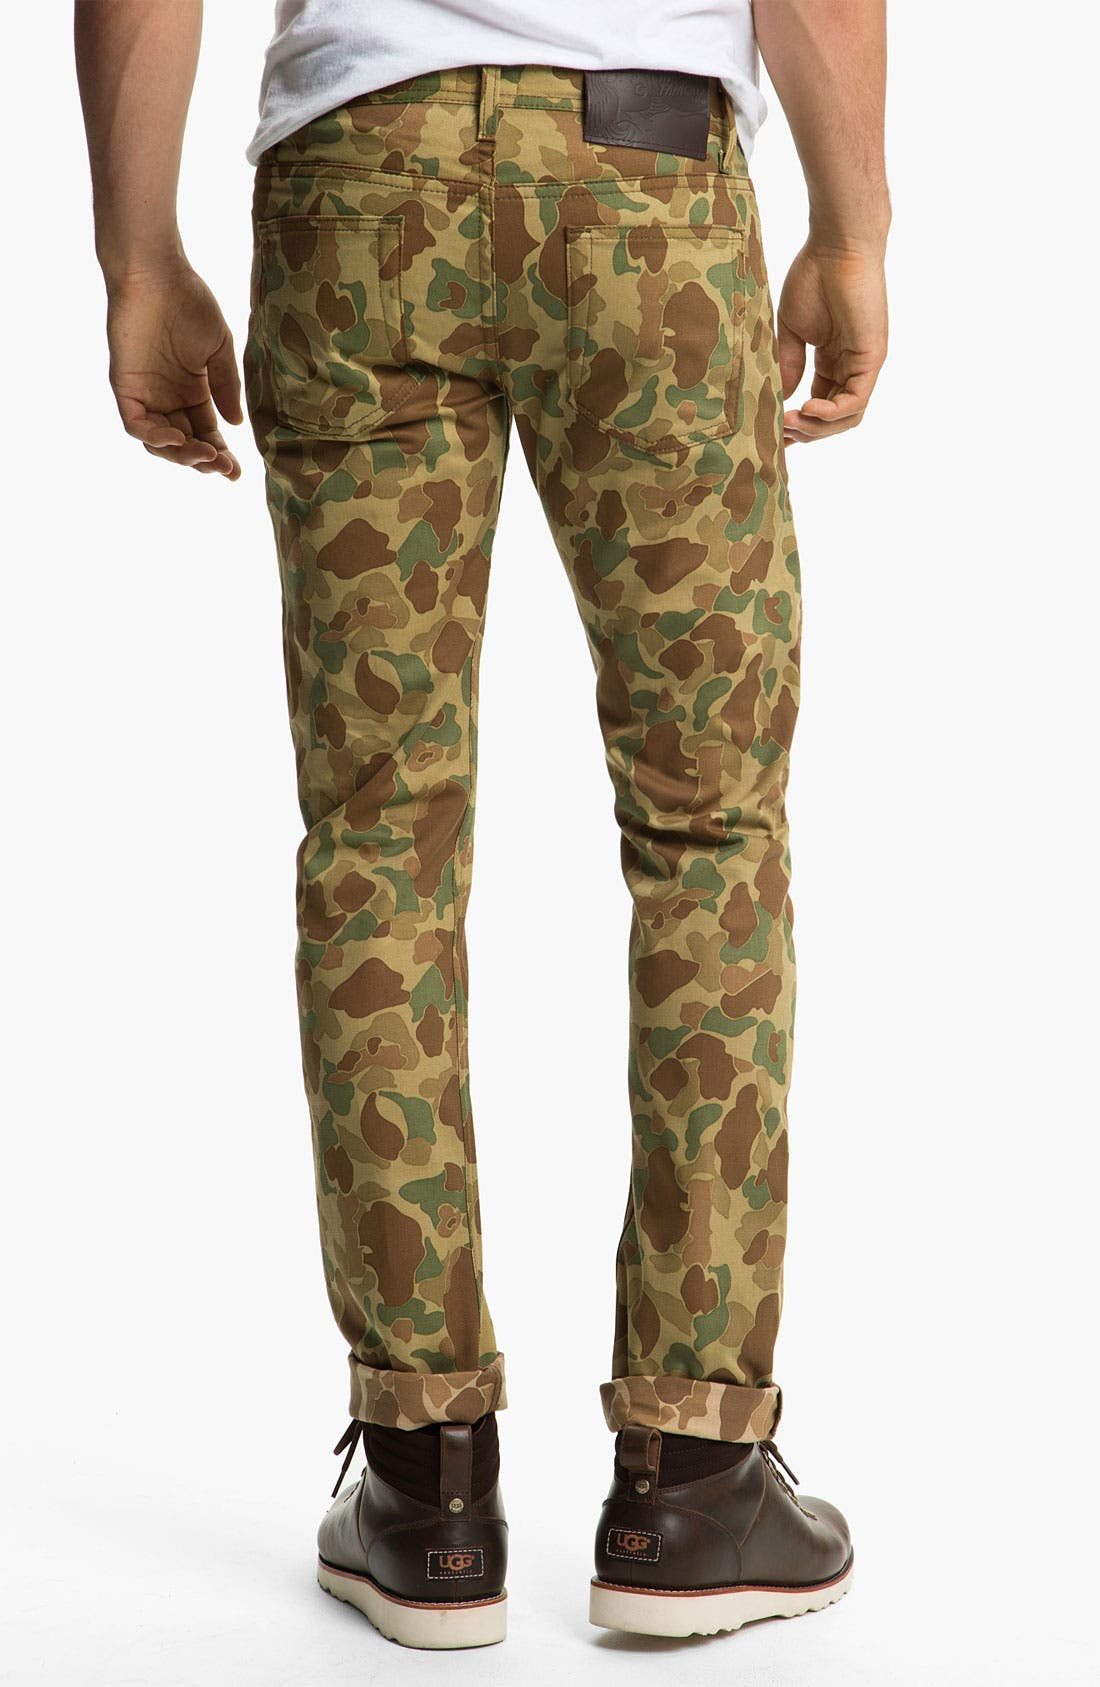 Alternate Image 1 Selected - Naked & Famous Denim 'Weird Guy' Dual Camo Print Slim Tapered Leg Pants